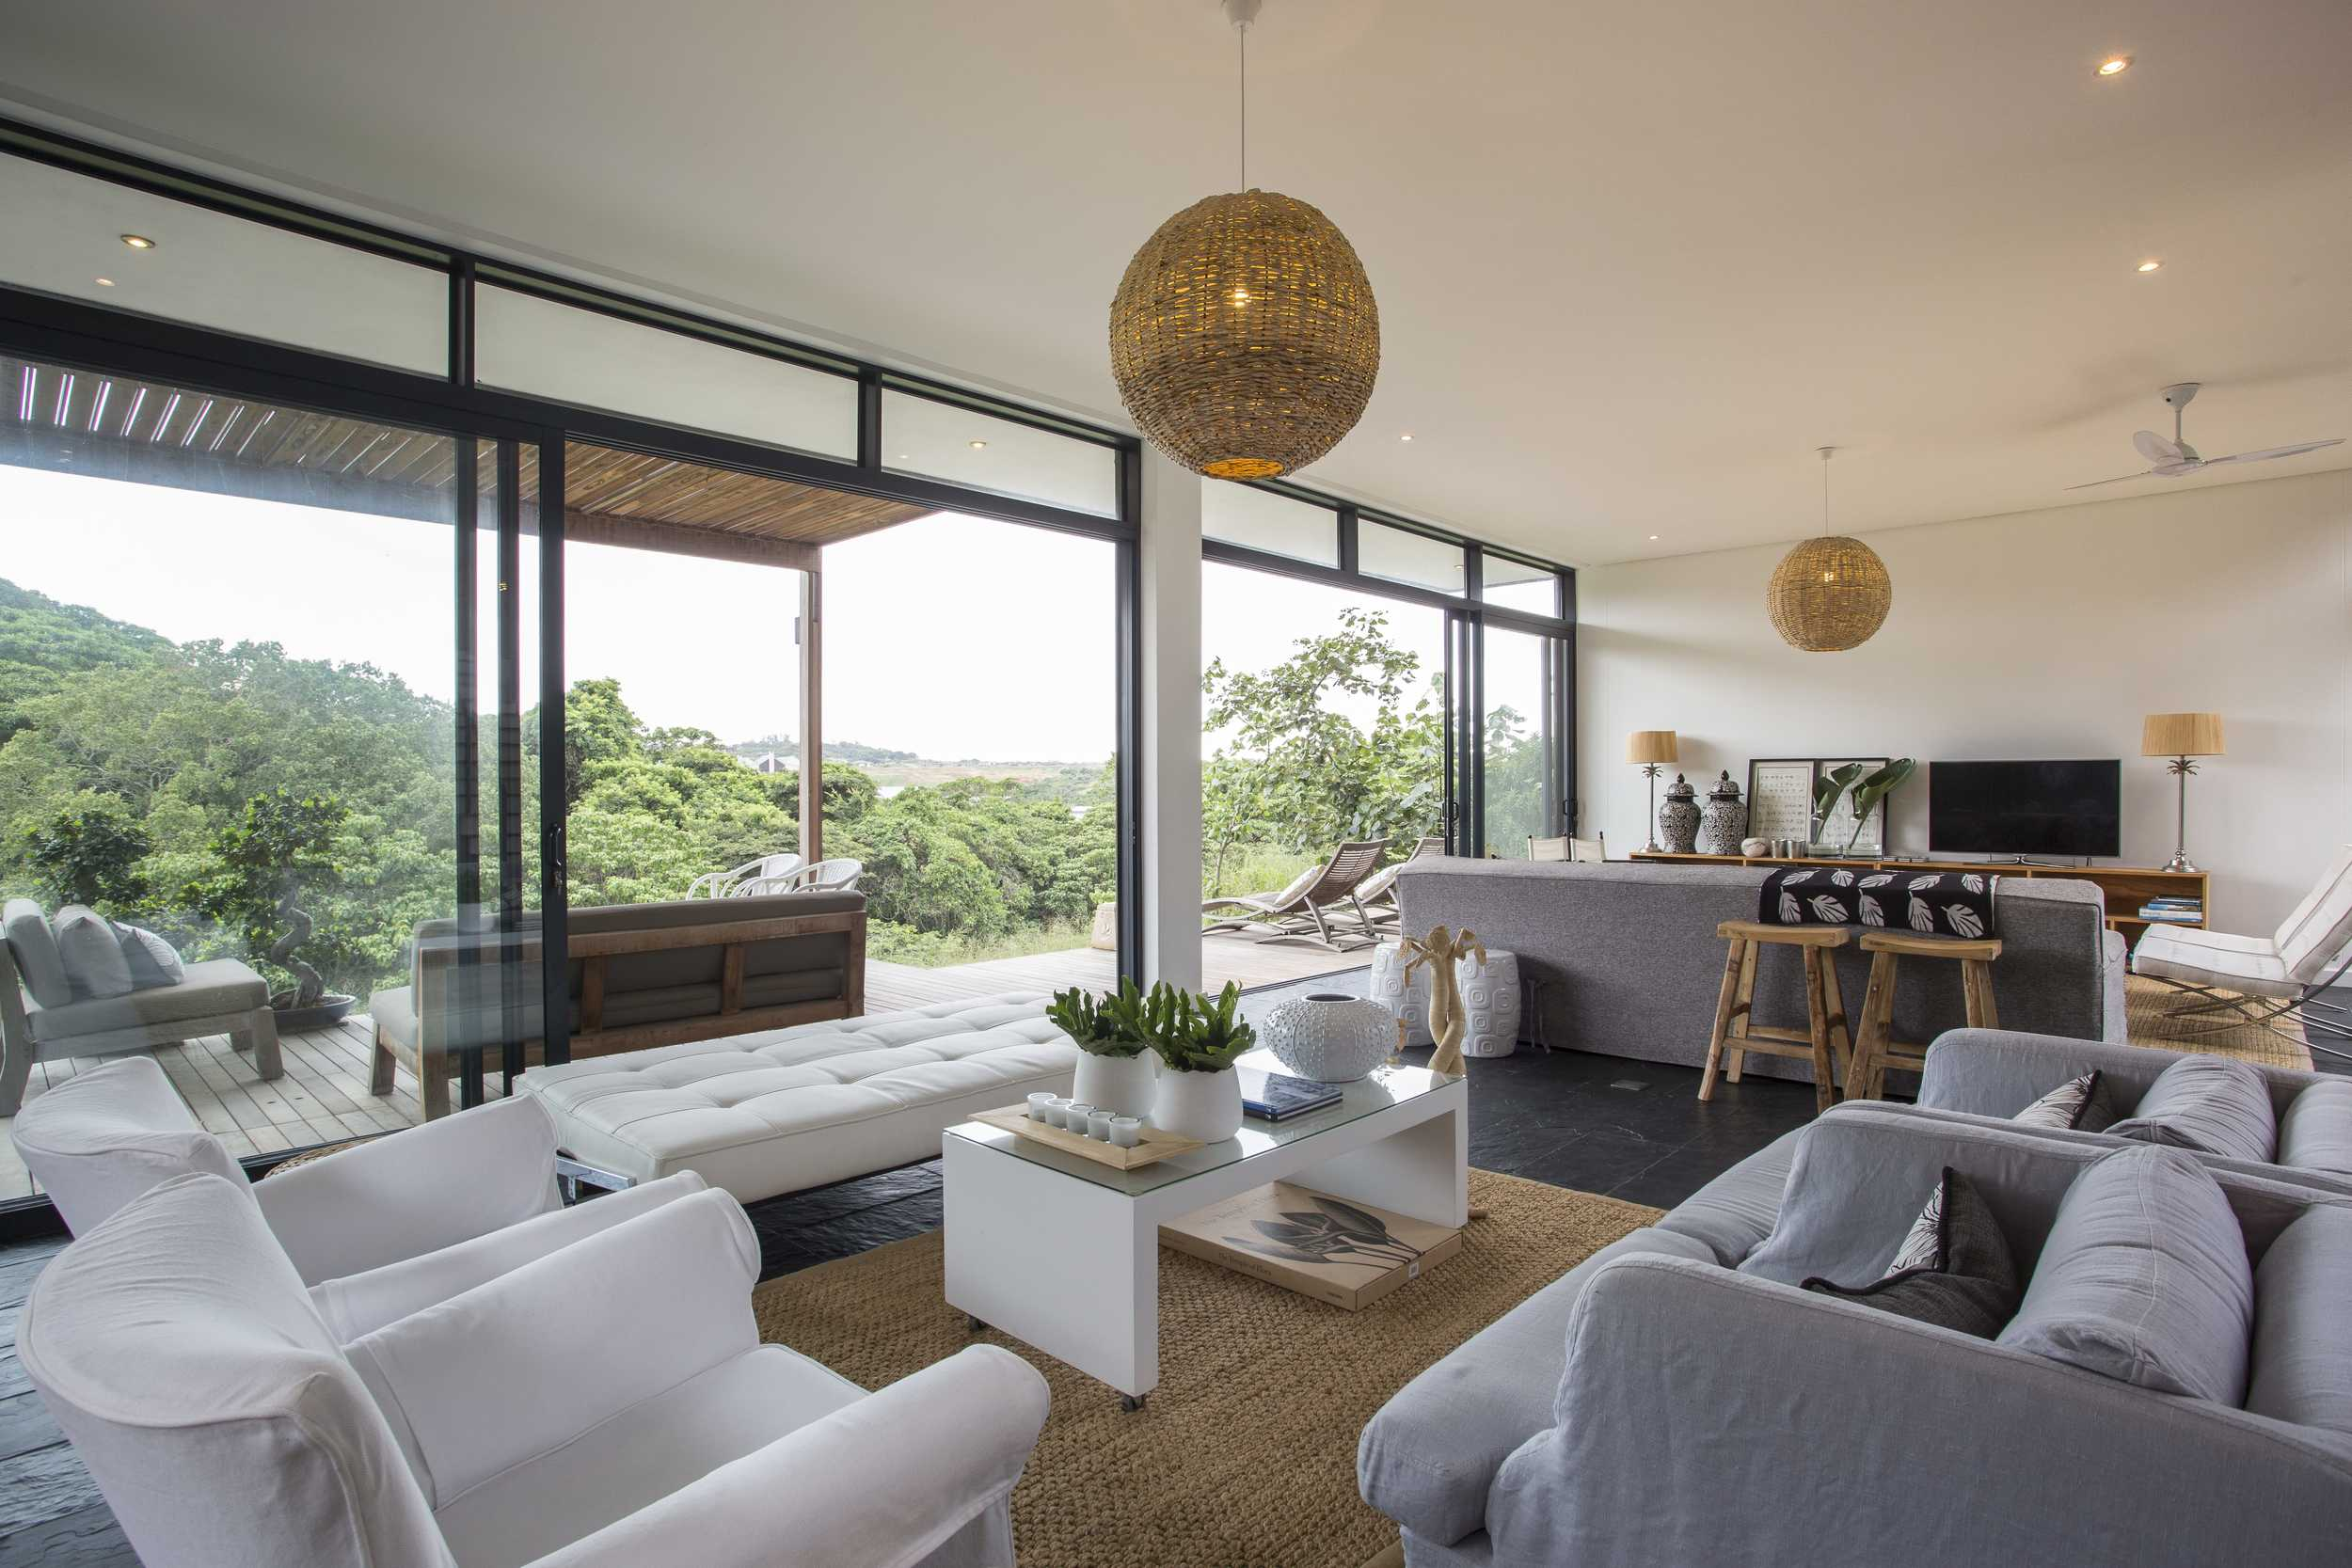 julia-rutherfoord-architect-dunkirk-estate-2014-01.jpg